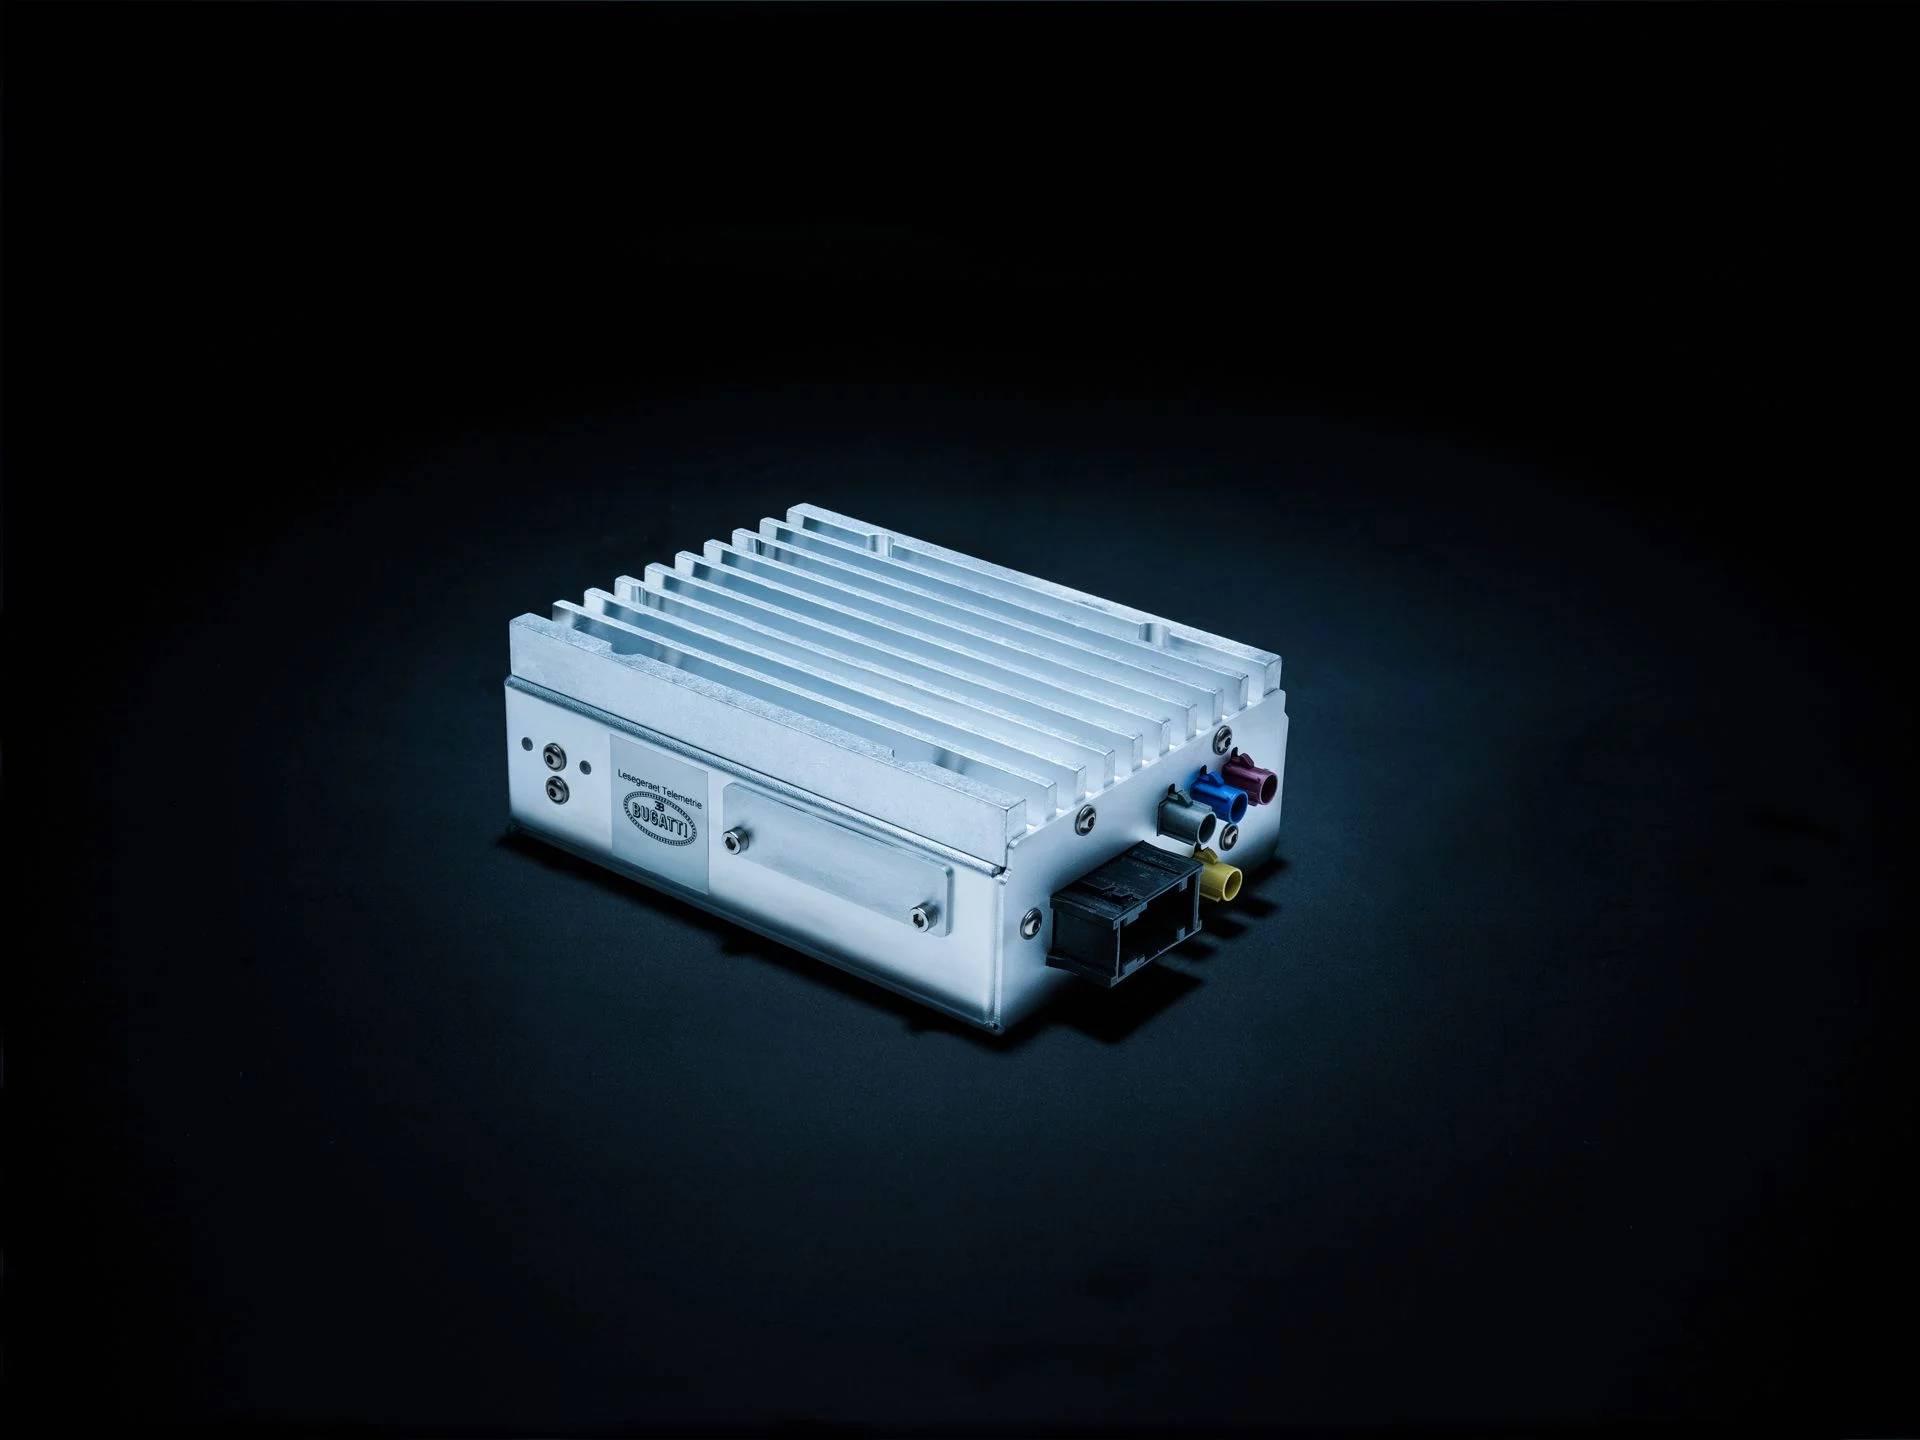 02_Bugatti_Telemetrie-box.jpg